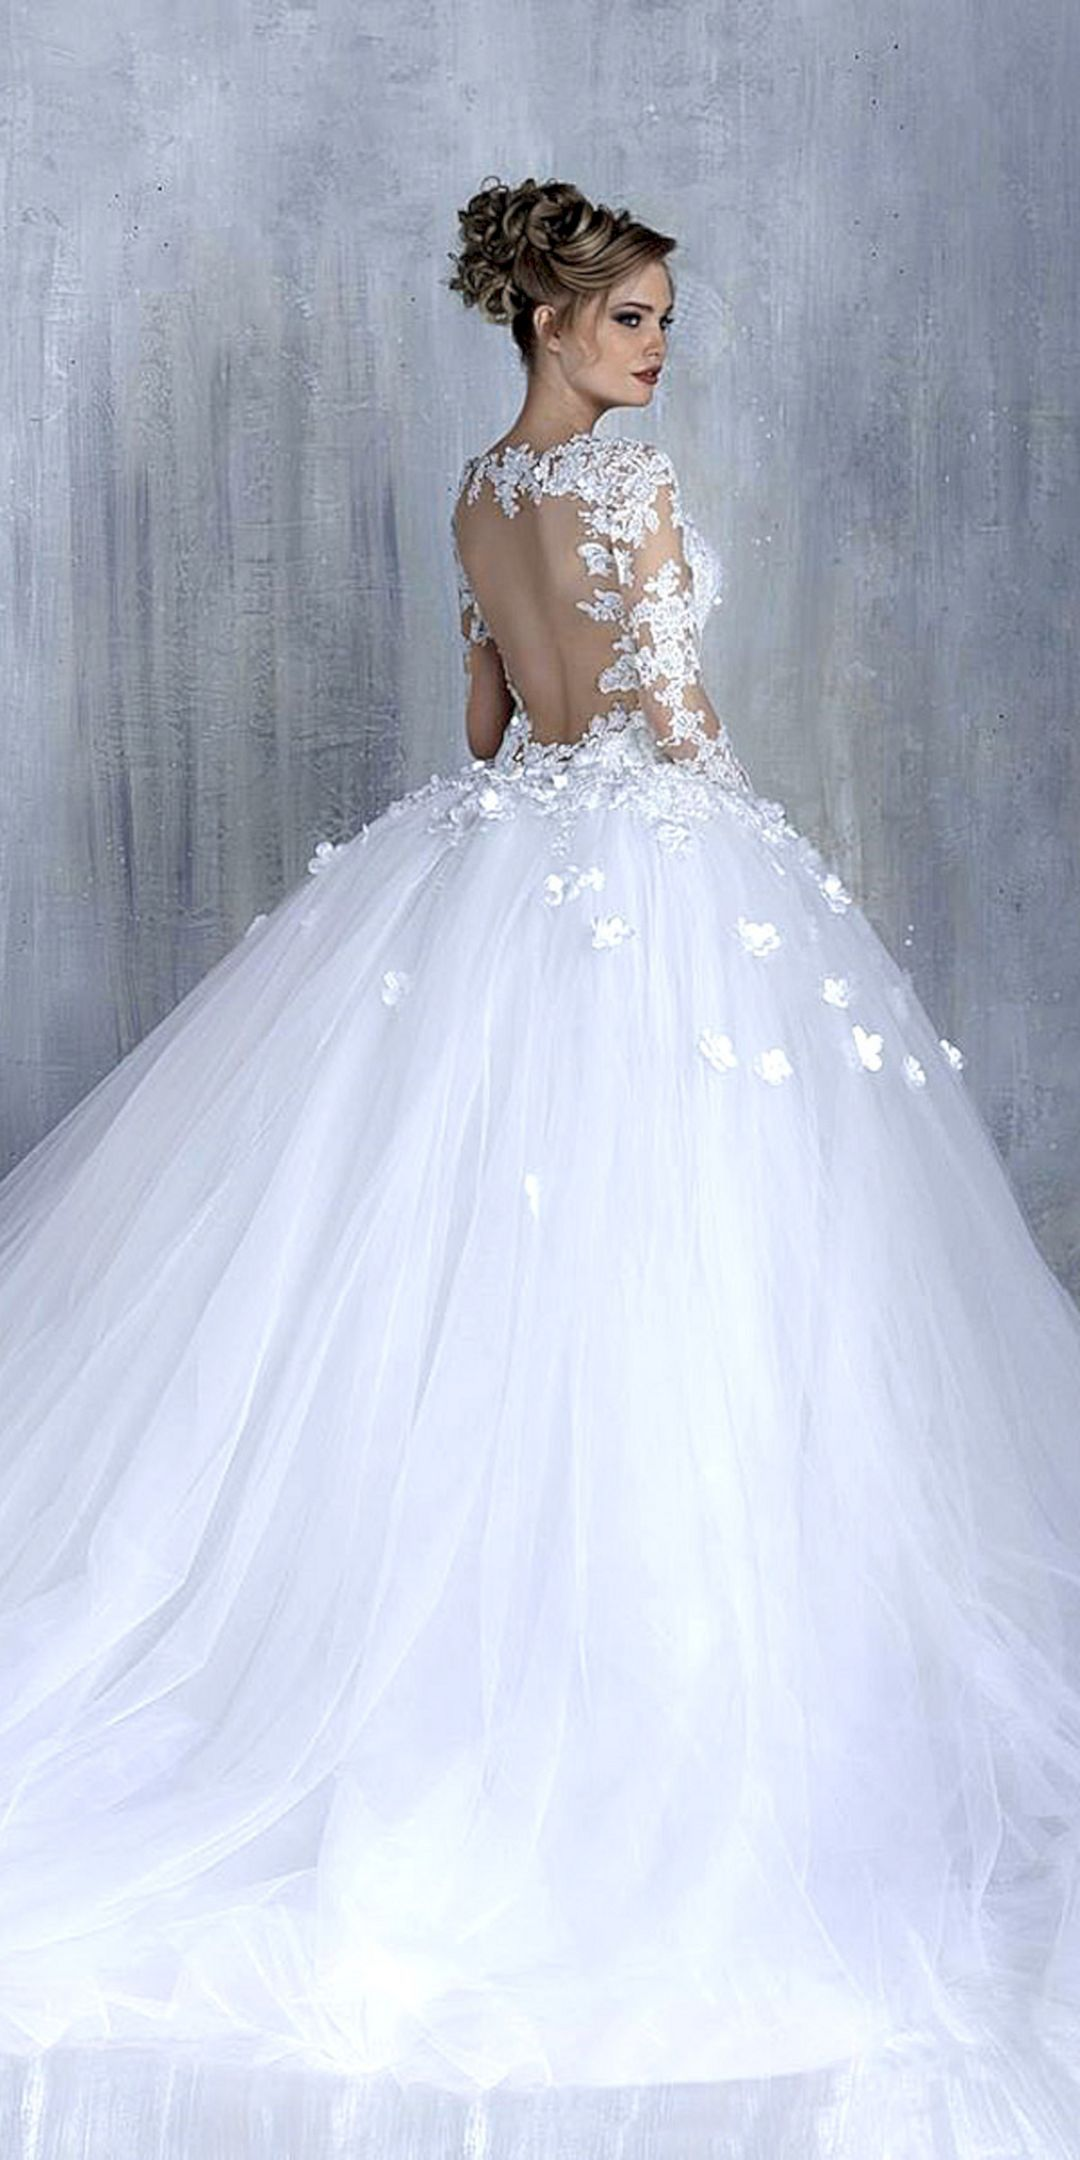 Best Princess Wedding Dresses Ideas: 50+ Awesome Inspirations